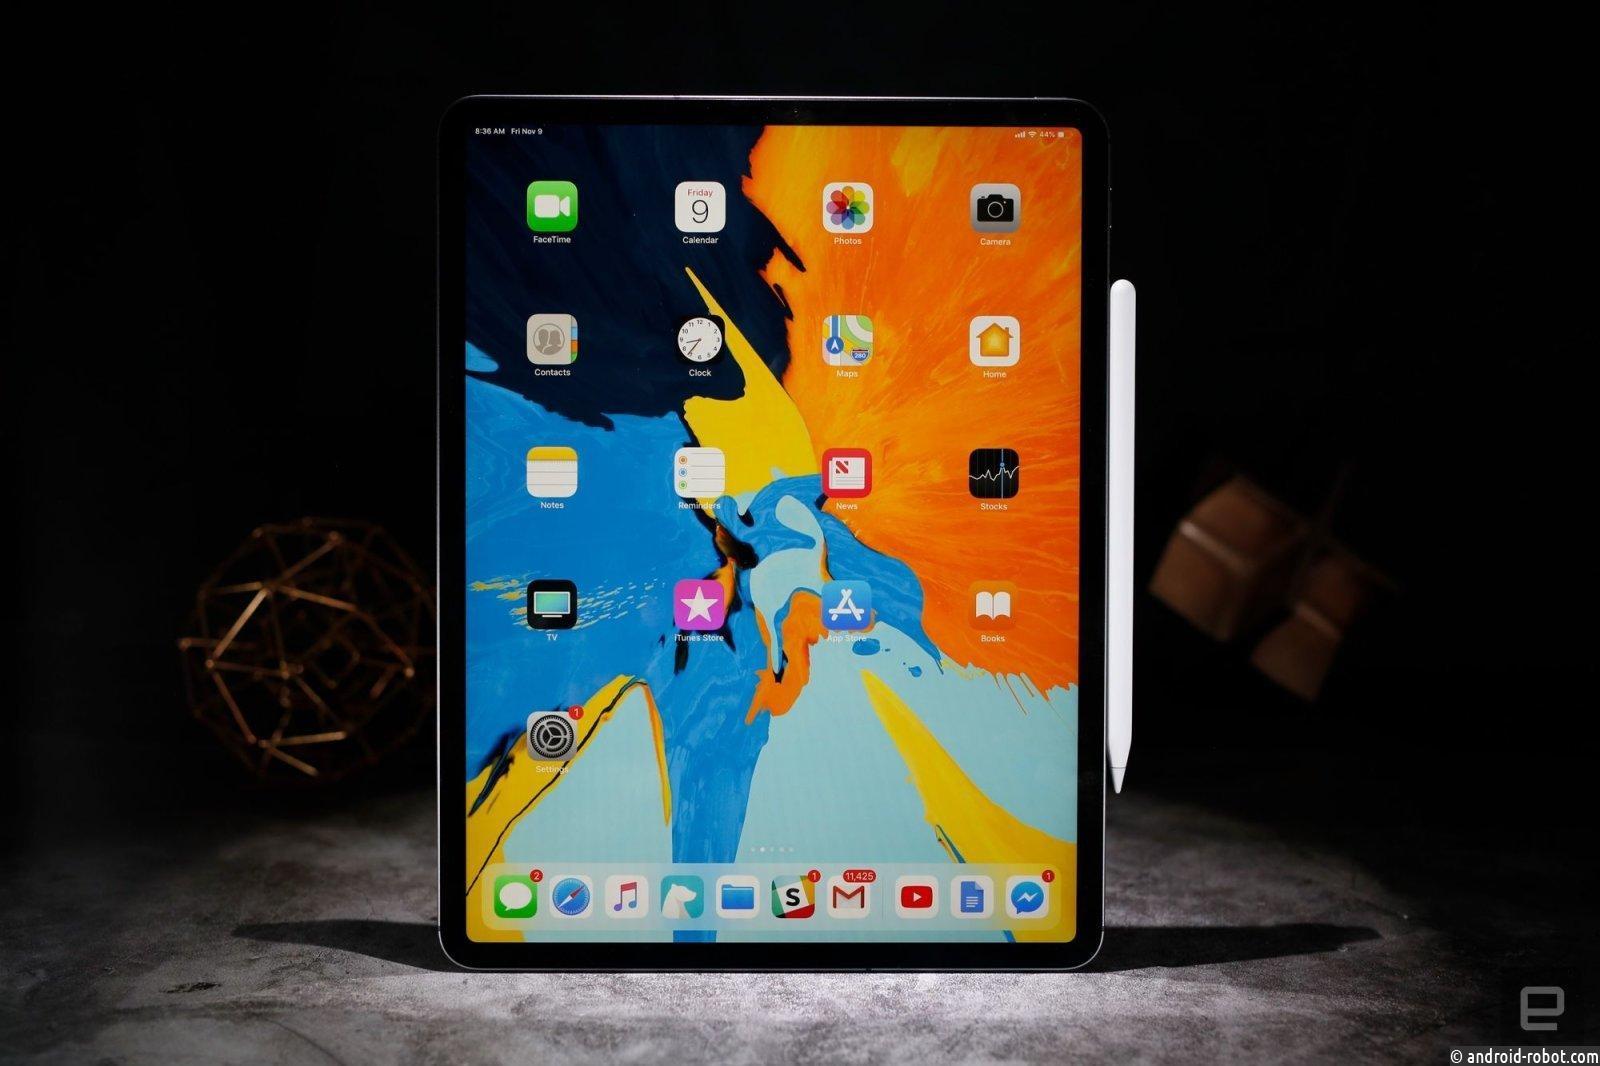 Apple объясняет процесс сборки iPad Pro в ответ на проблемы с изгибом